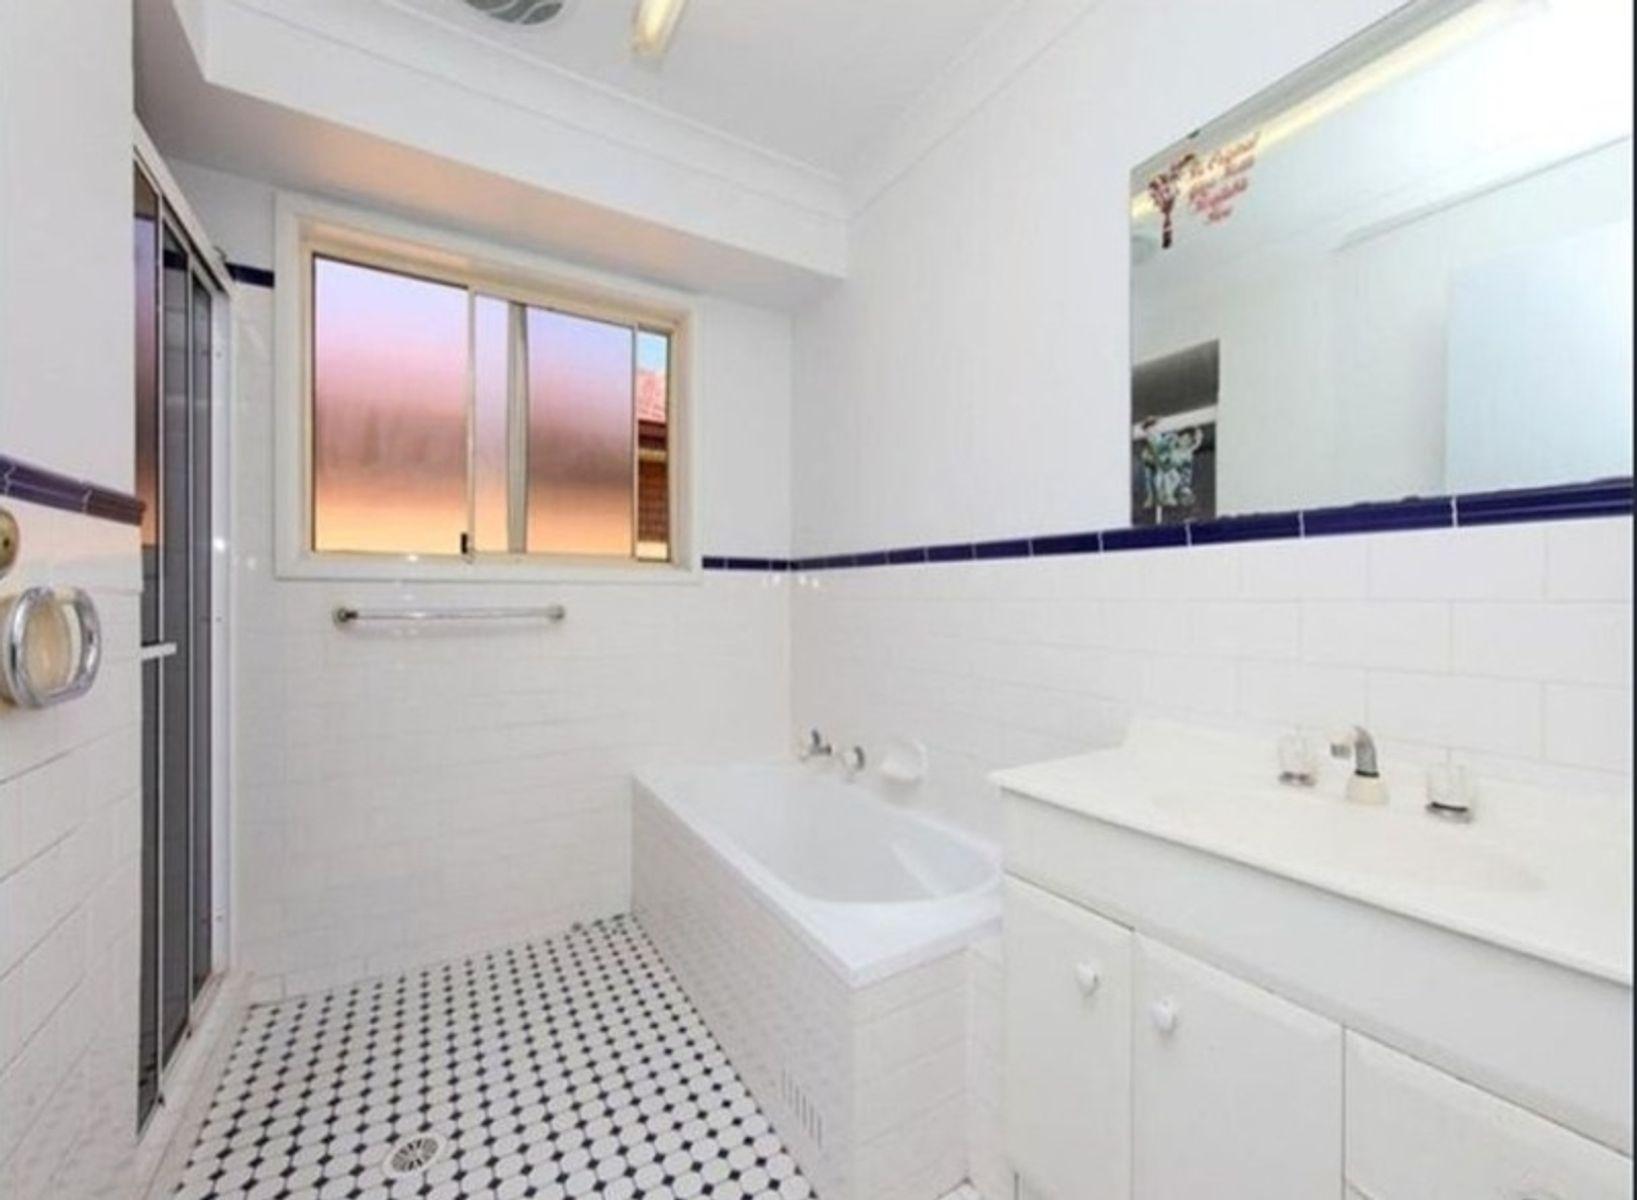 Room 3/48 Steel Street, Jesmond, NSW 2299